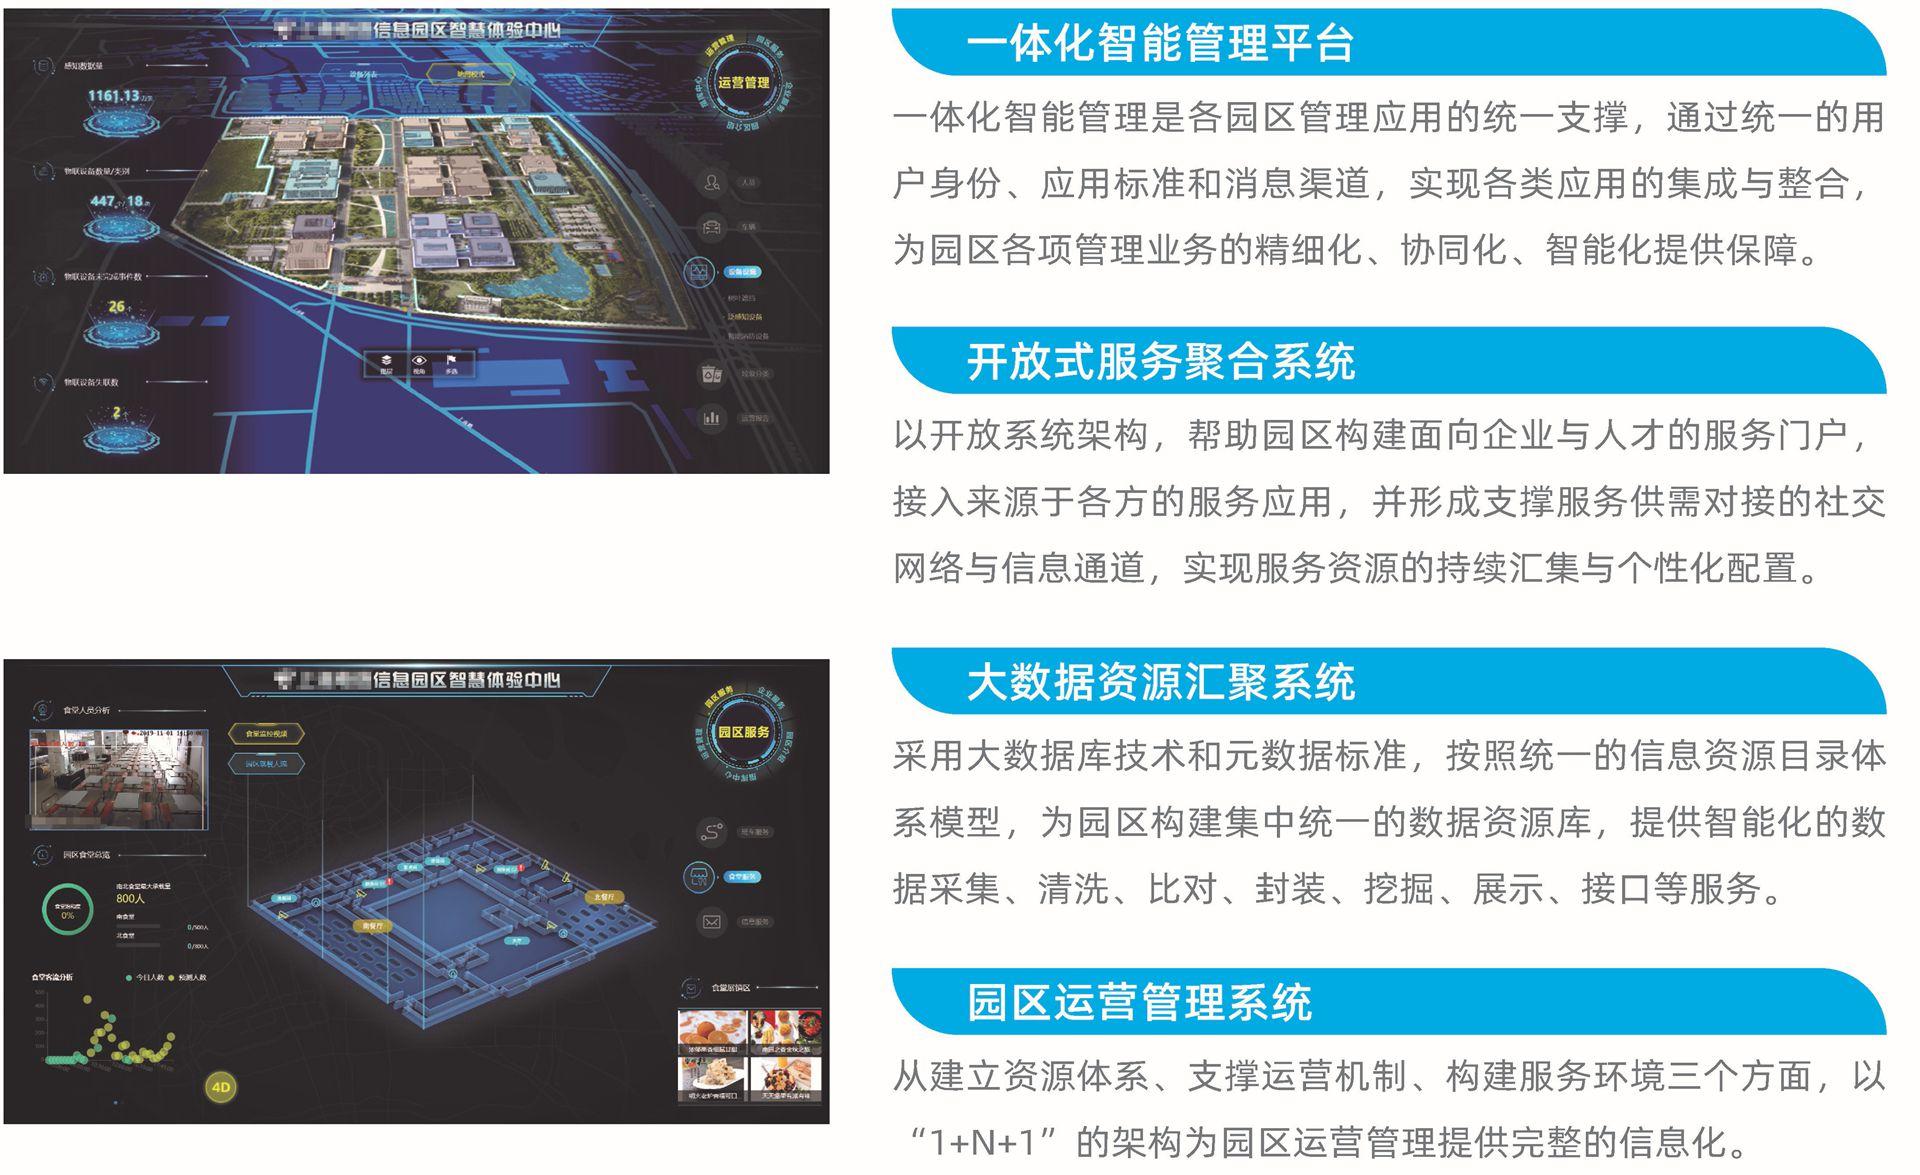 services-details-16.jpg